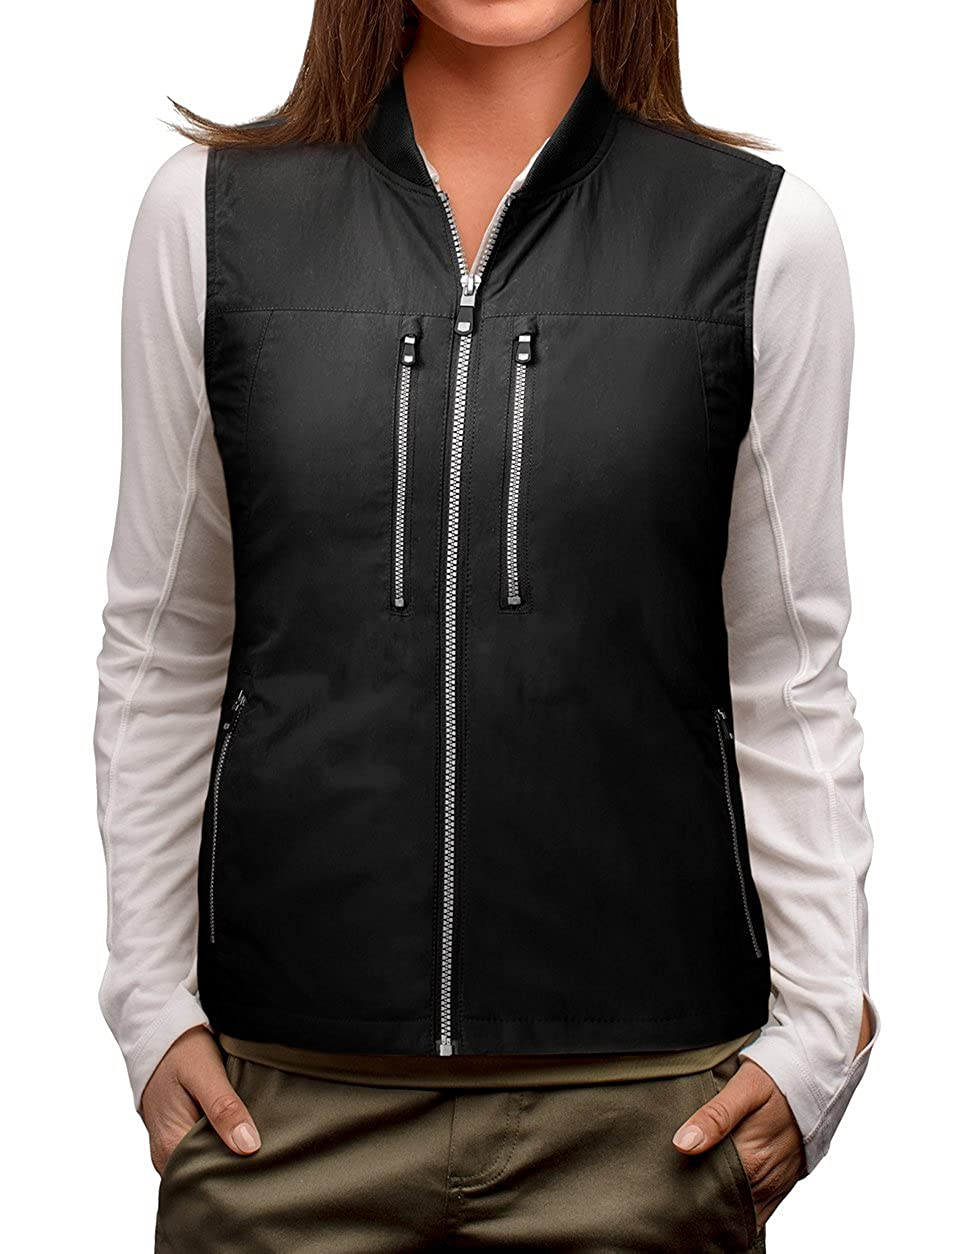 Black SCOTTeVEST 101 Travel Vest for Women with Pockets  Lightweight Utility Vest